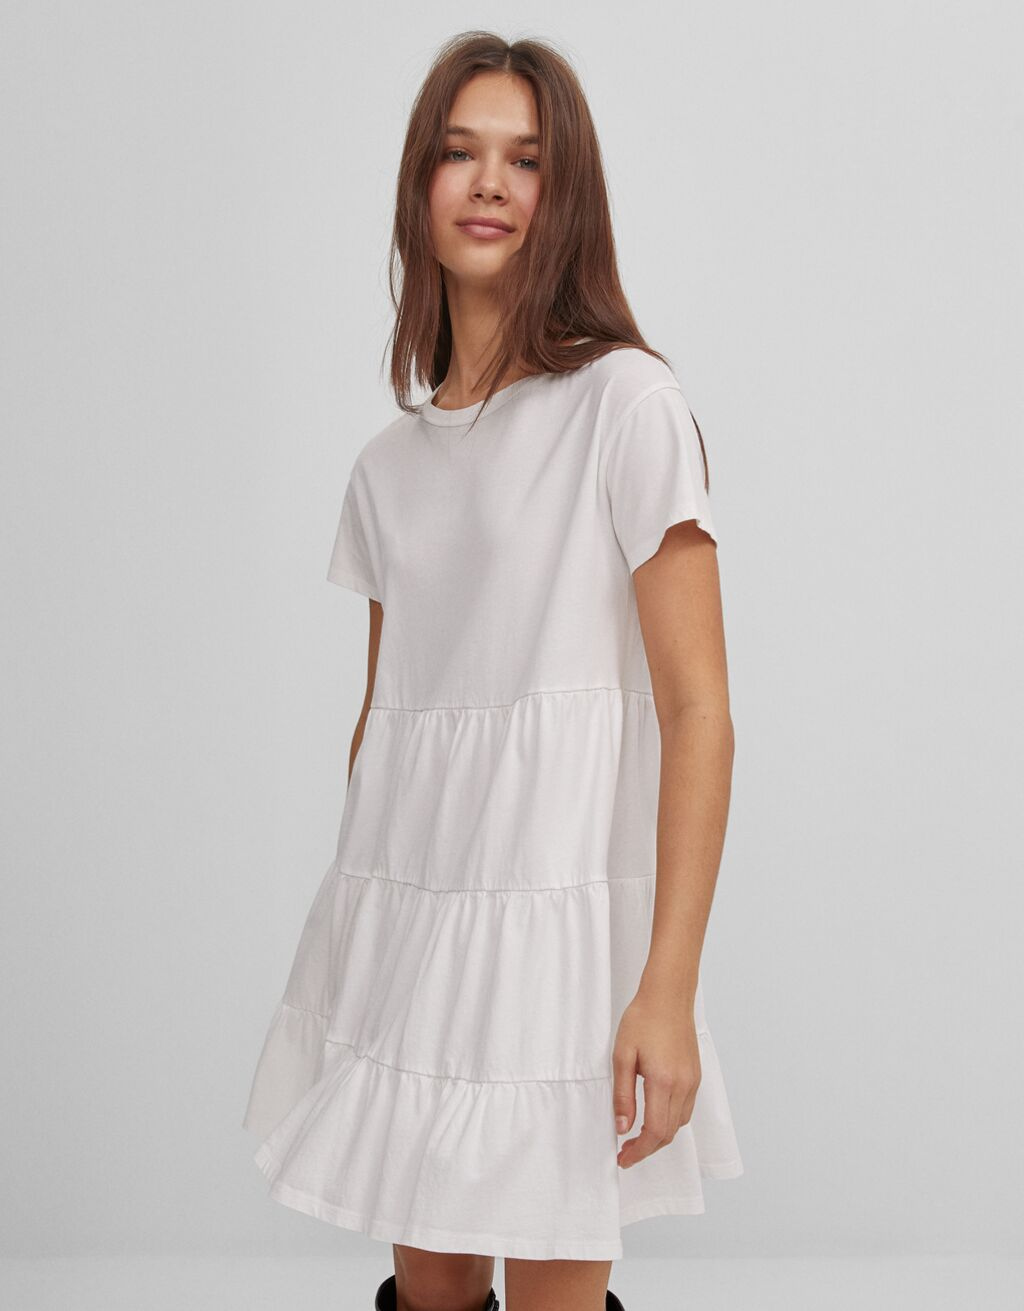 Короткое платье в стиле бэби-долл